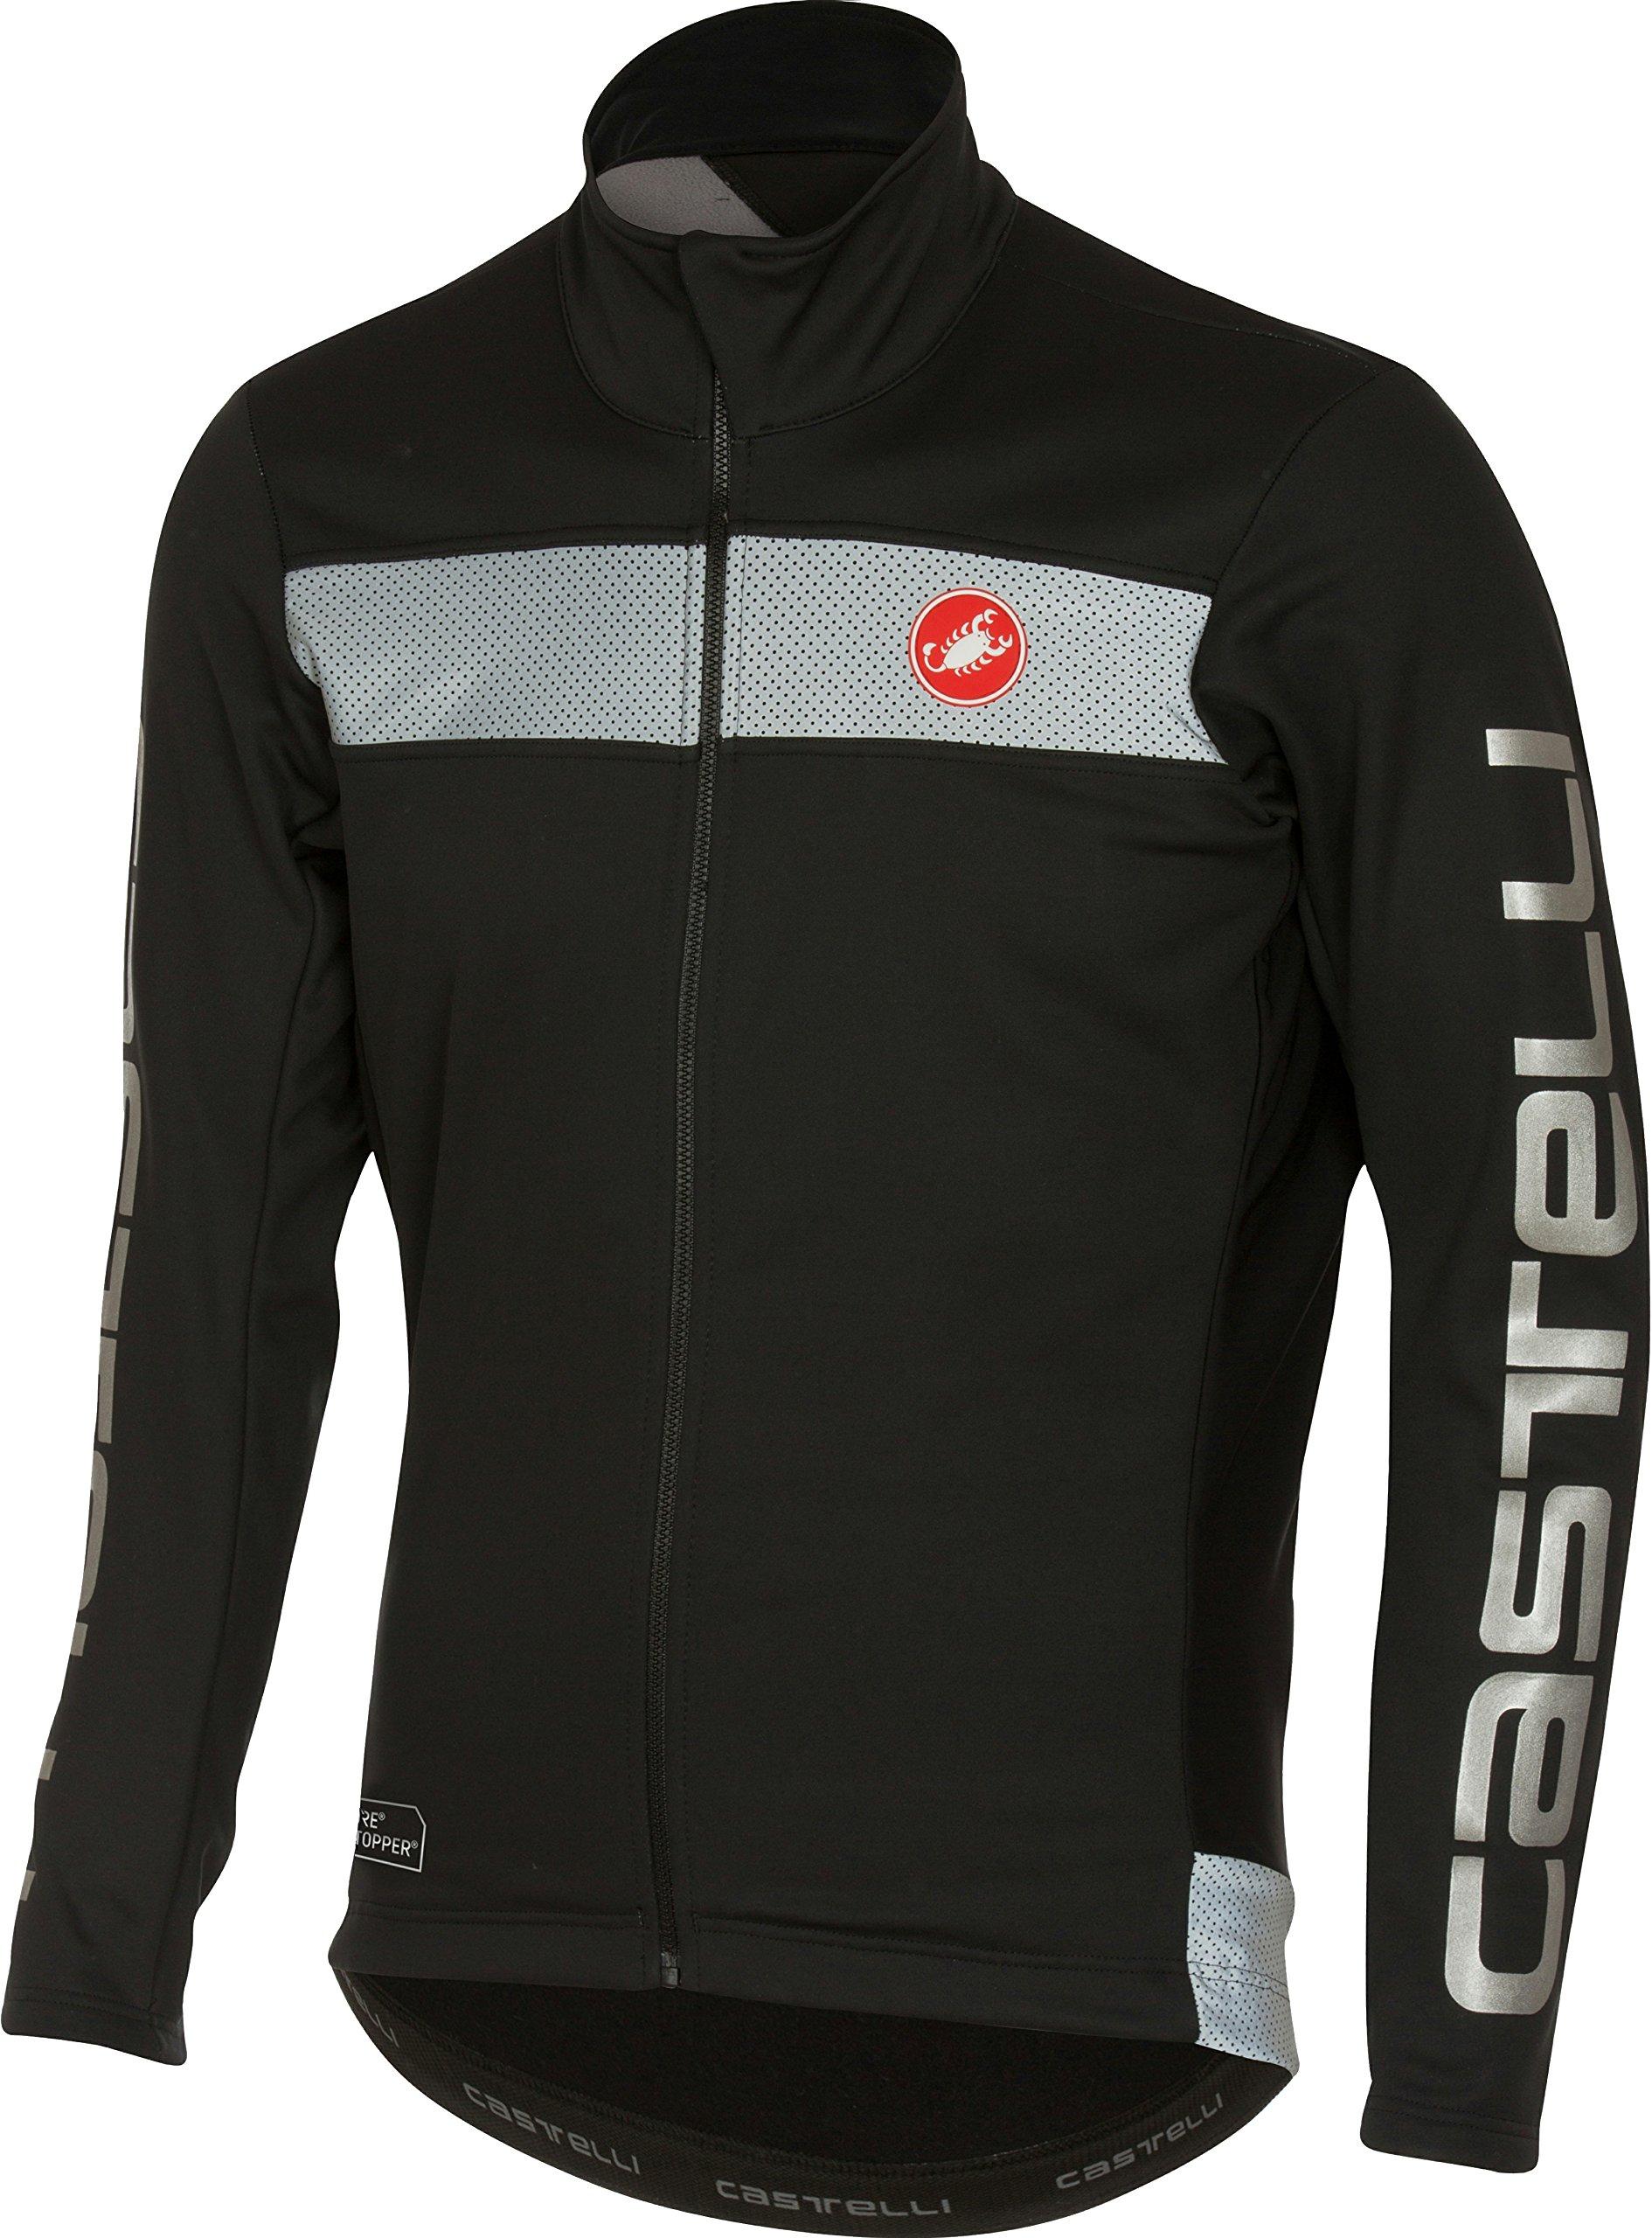 Castelli Raddoppia Jacket - Men's Black, XL